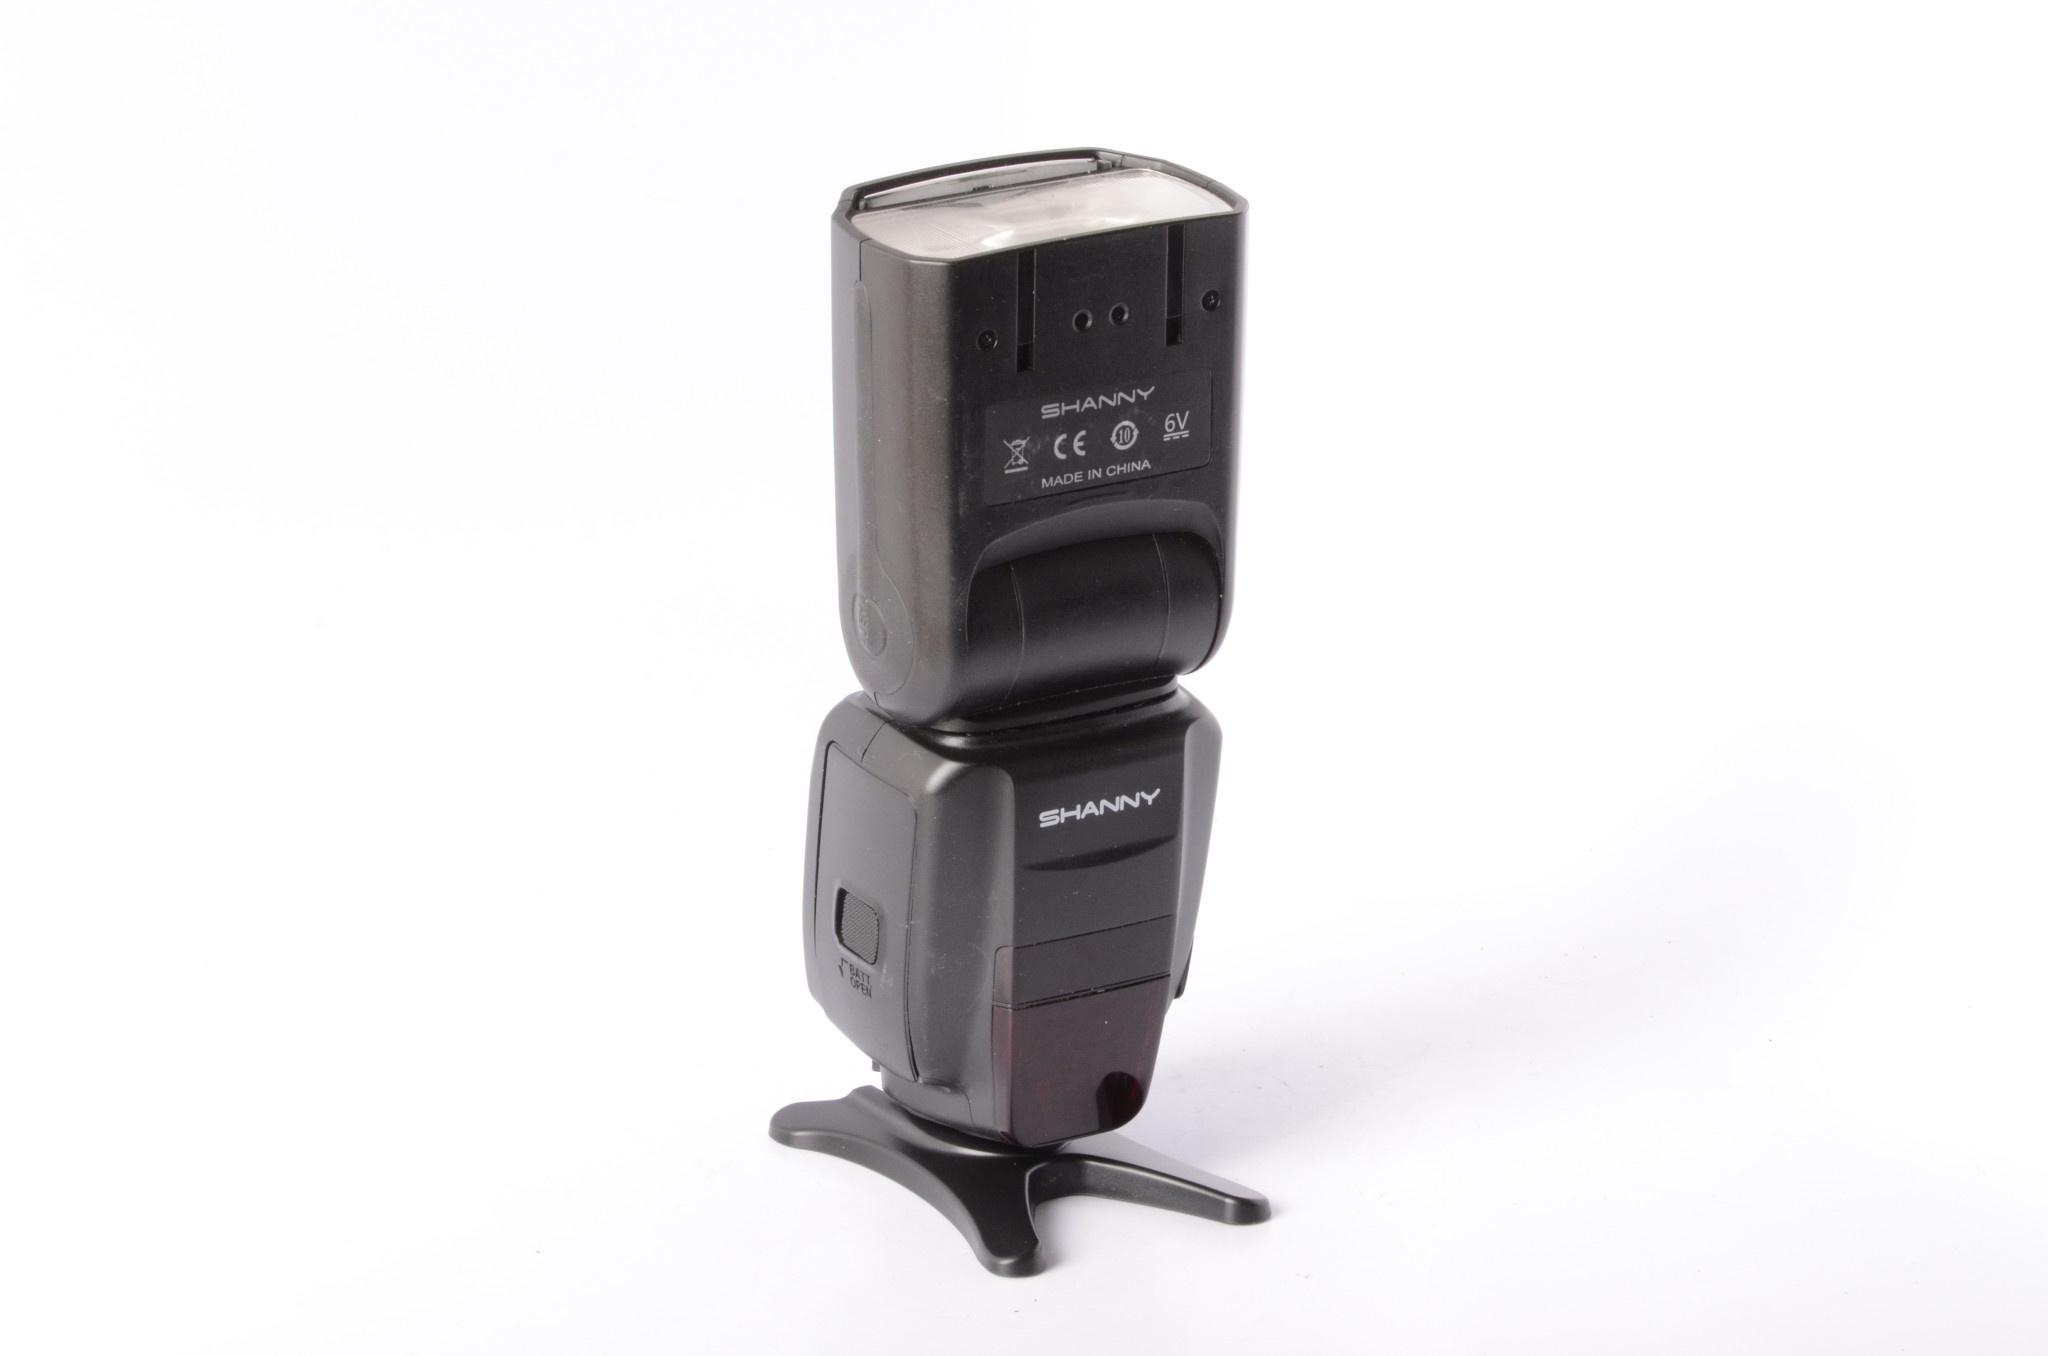 Shanny Shanny 600 Flash Canon SN600SC Speedlight USED